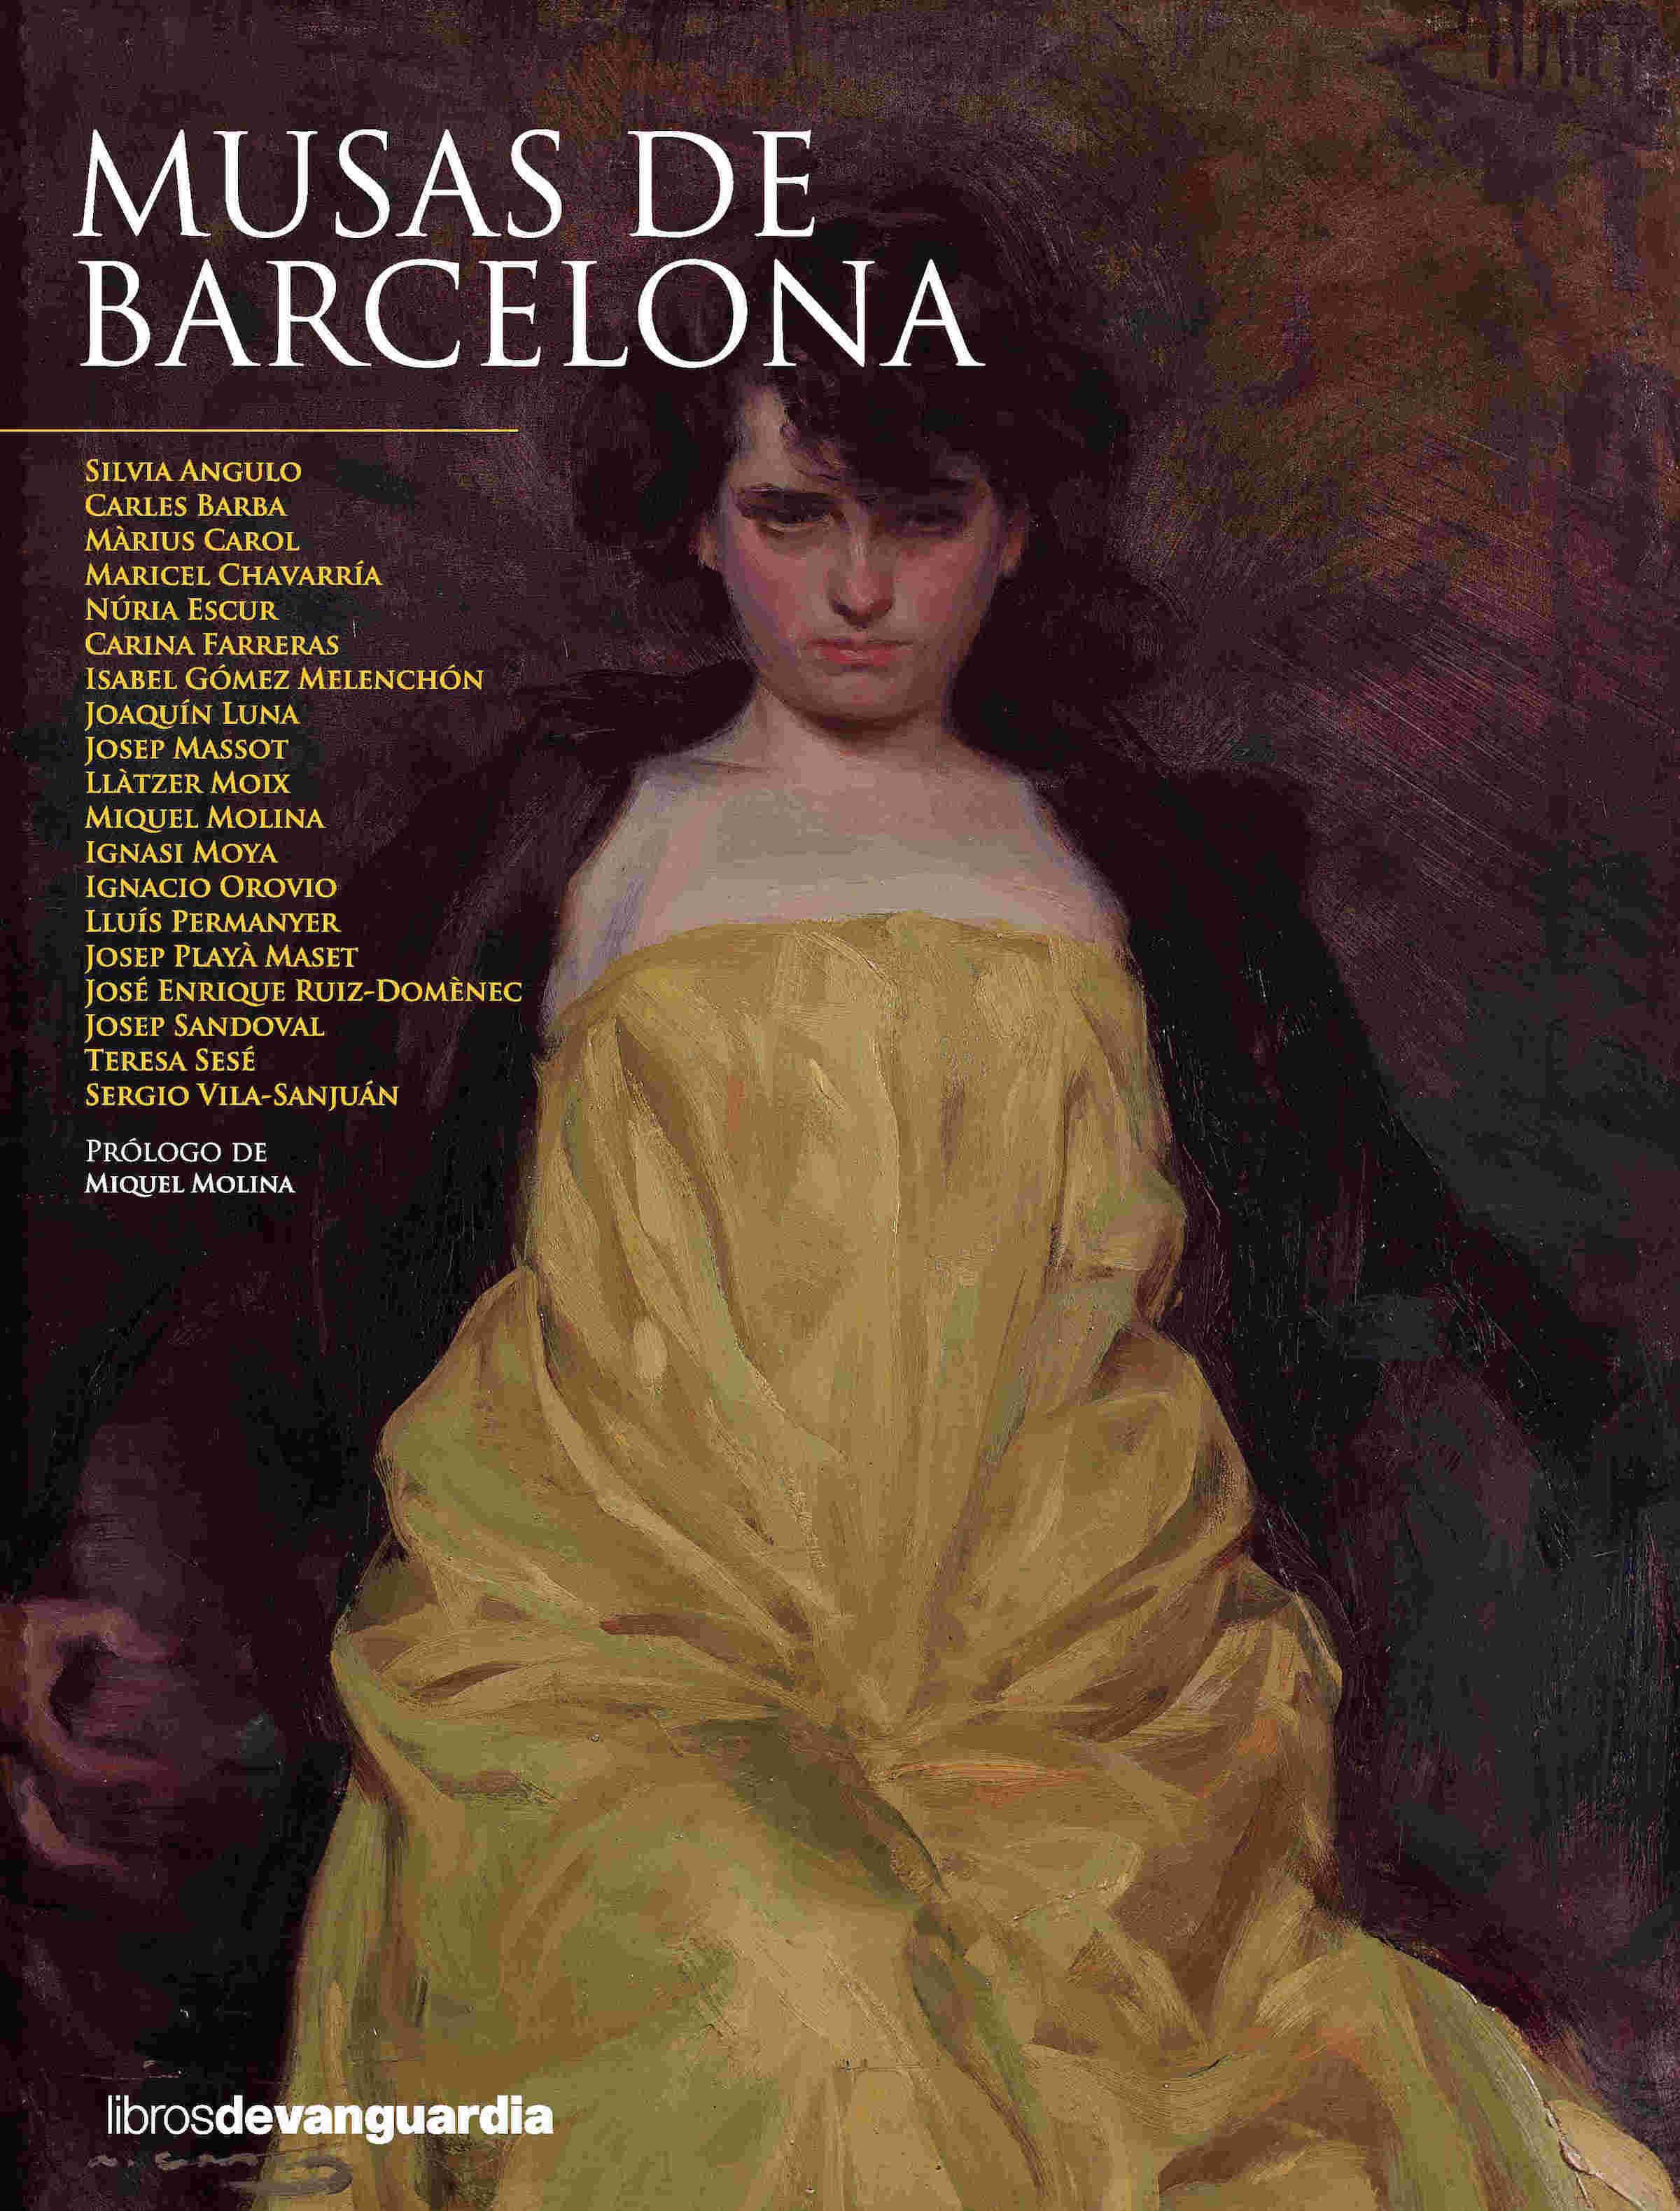 Musas de Barcelona